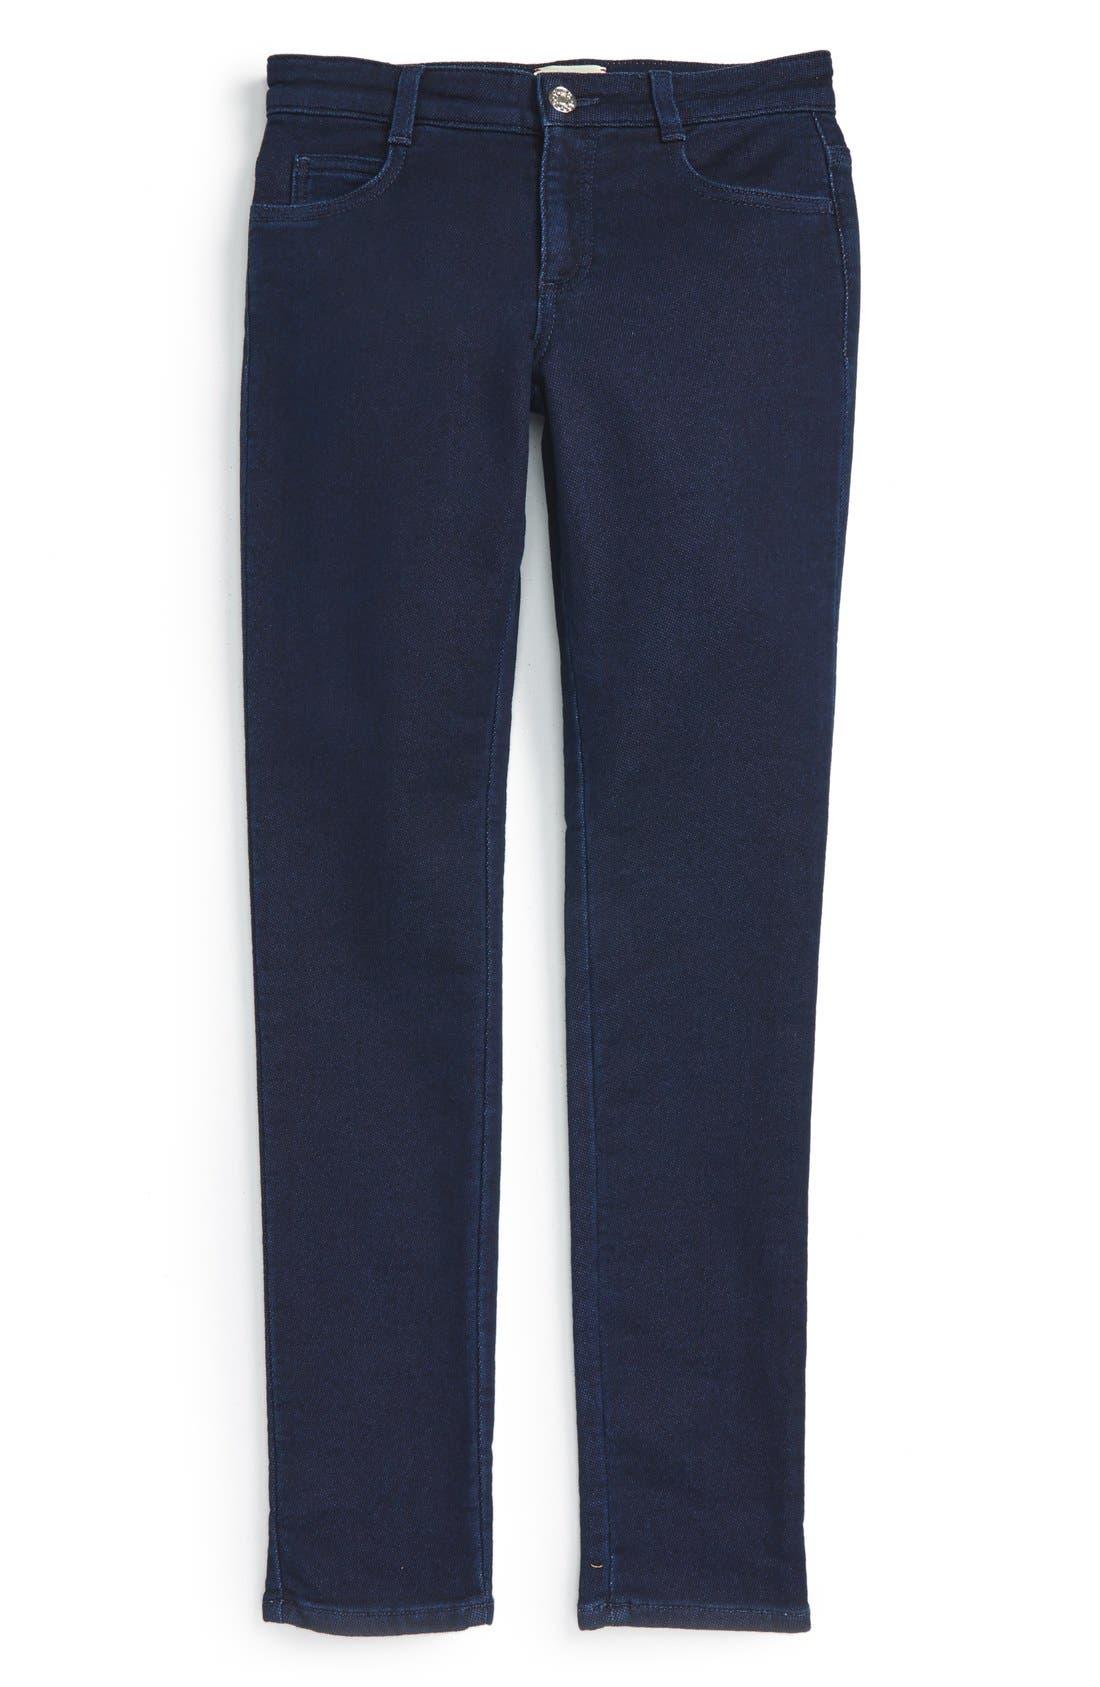 Gucci Skinny Knit Pants (Little Girls & Big Girls)